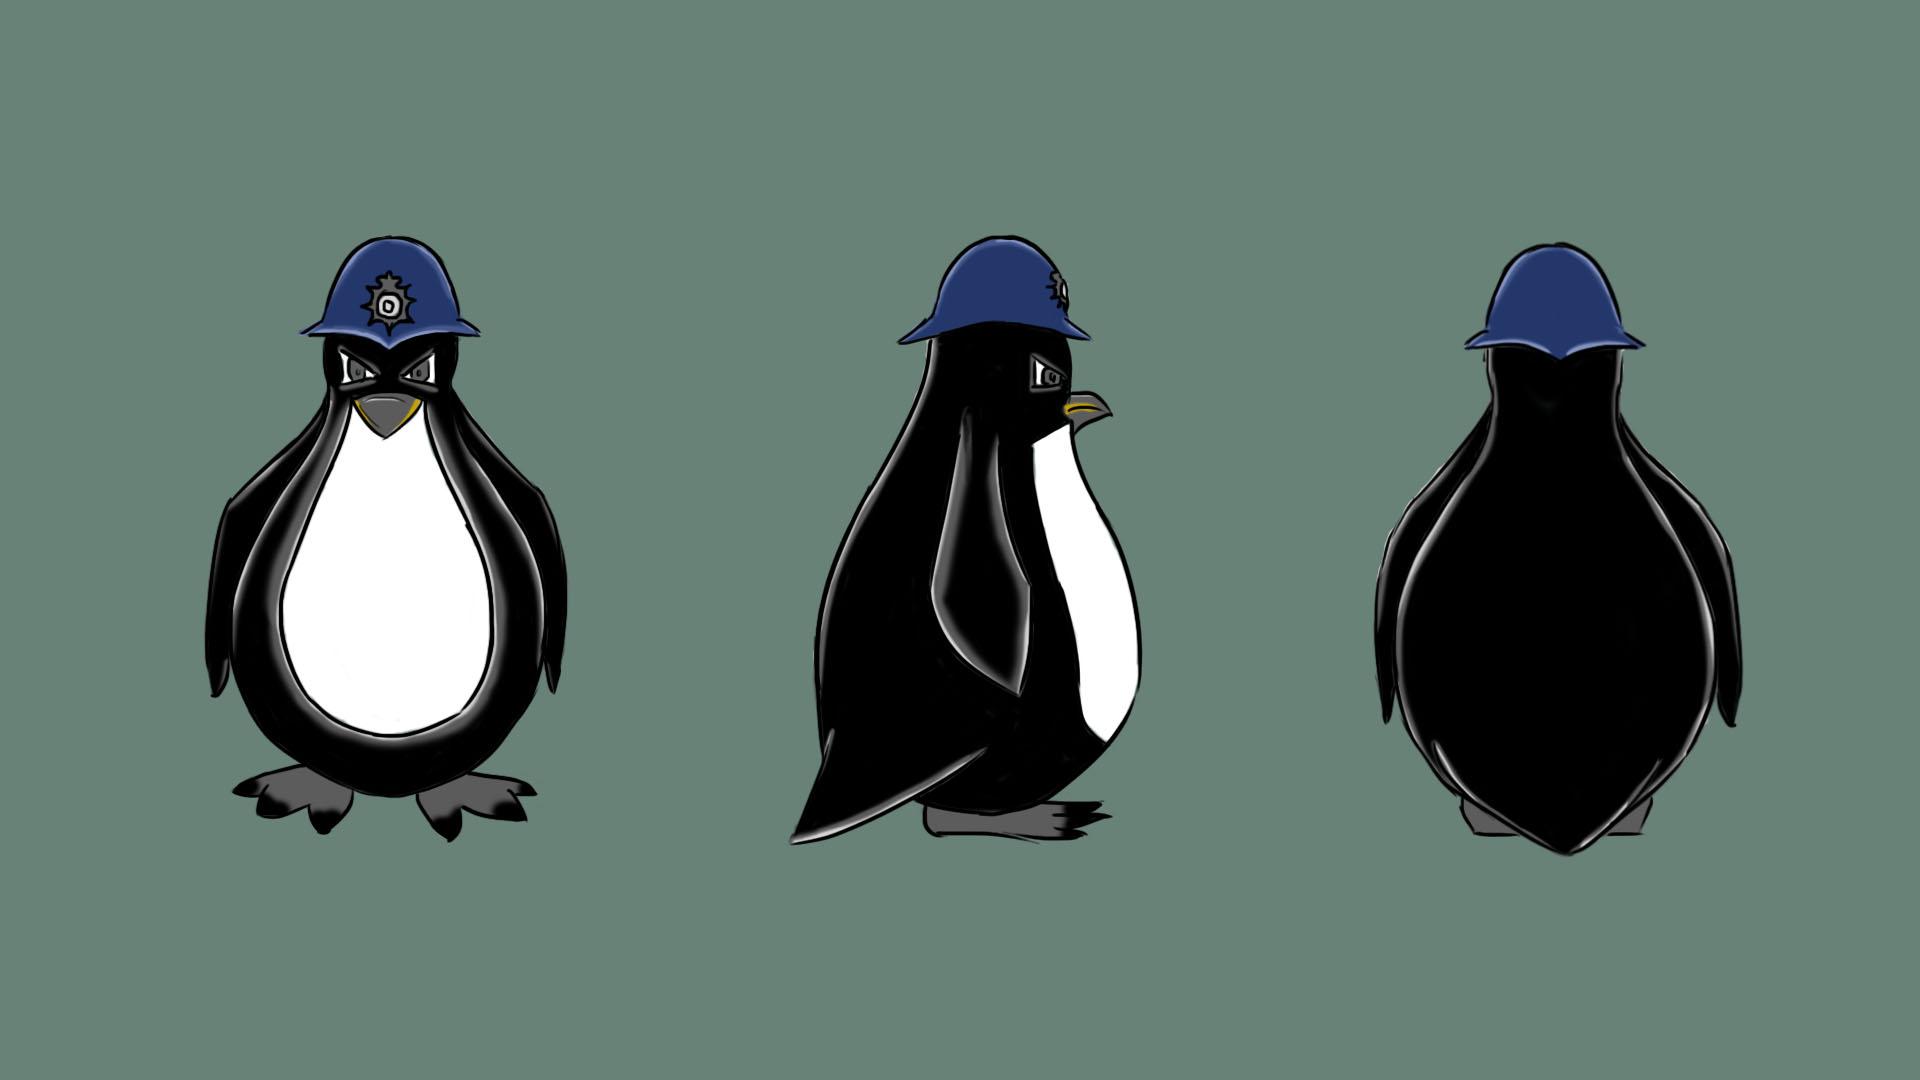 Penguin Turnaround